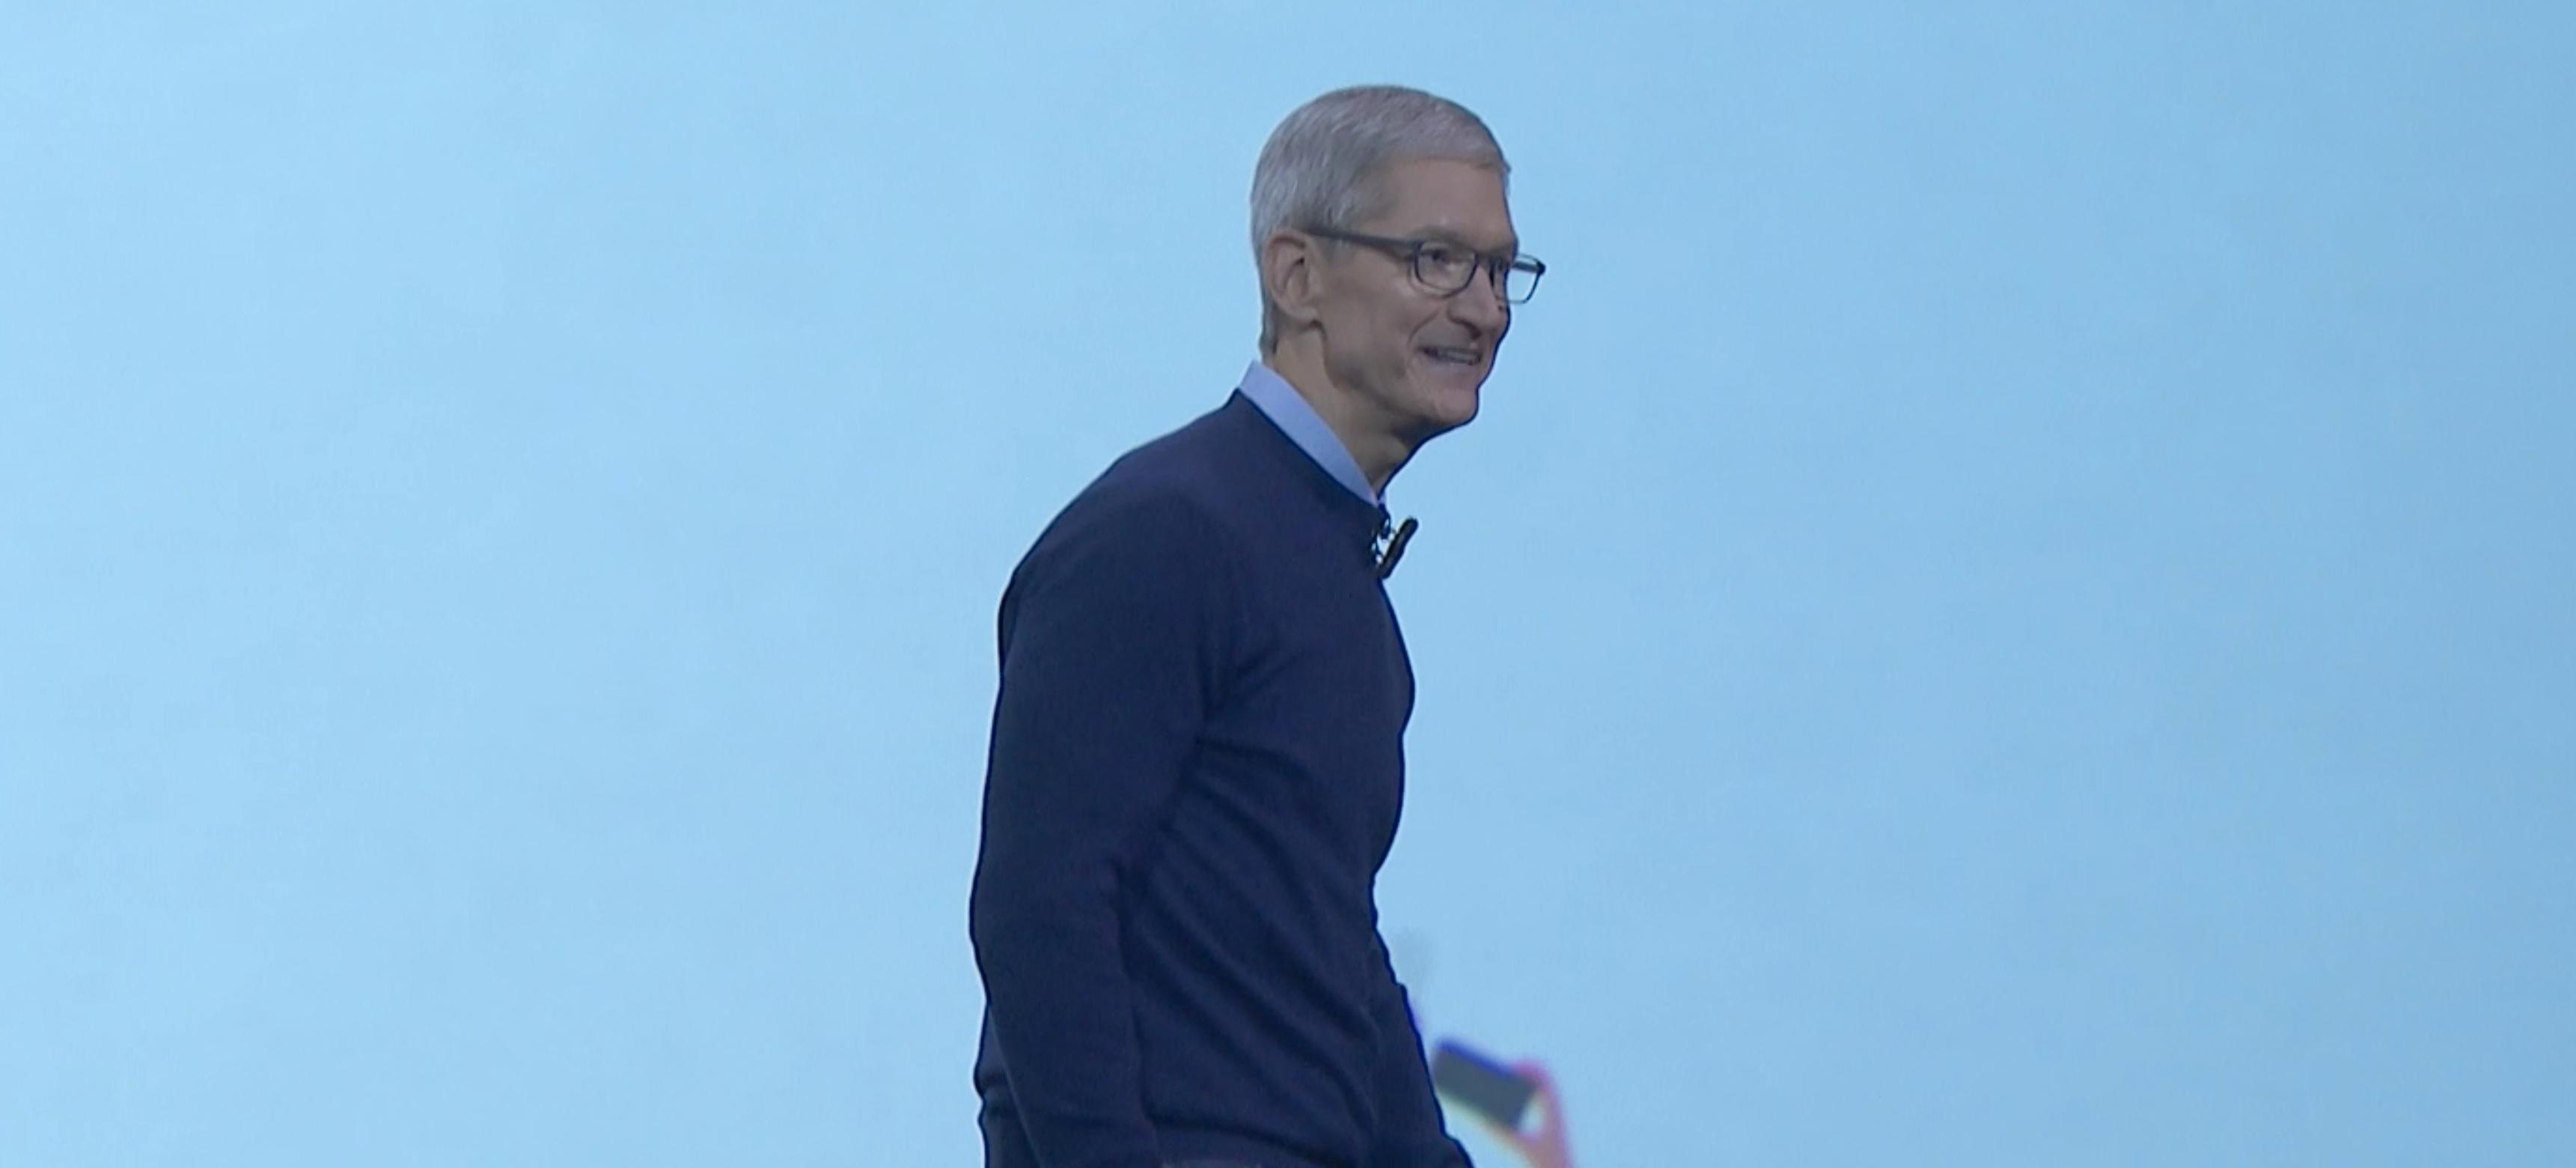 Apple-sjef Tim Cook entrer scenen.